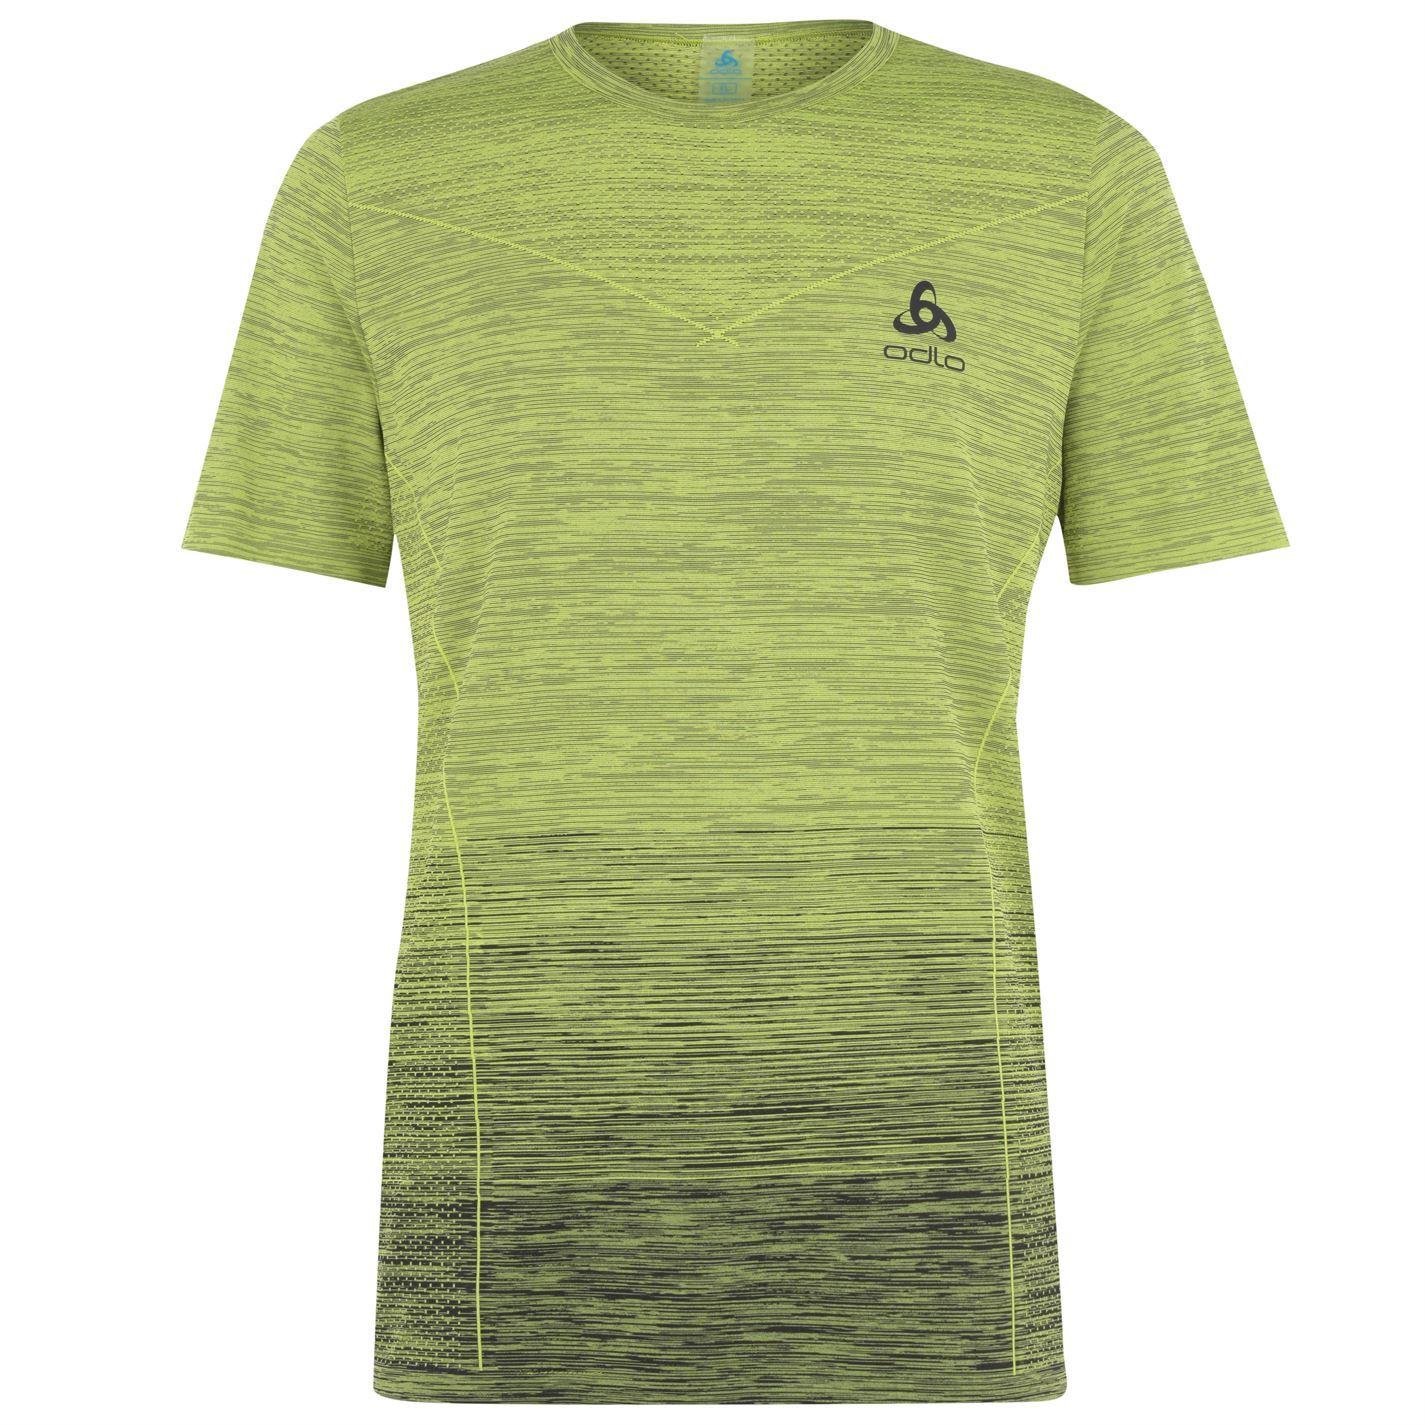 Details zu Odlo Kamile Crew Neck Running T Shirt Mens Lime Fitness Top Tee Shirt X Large